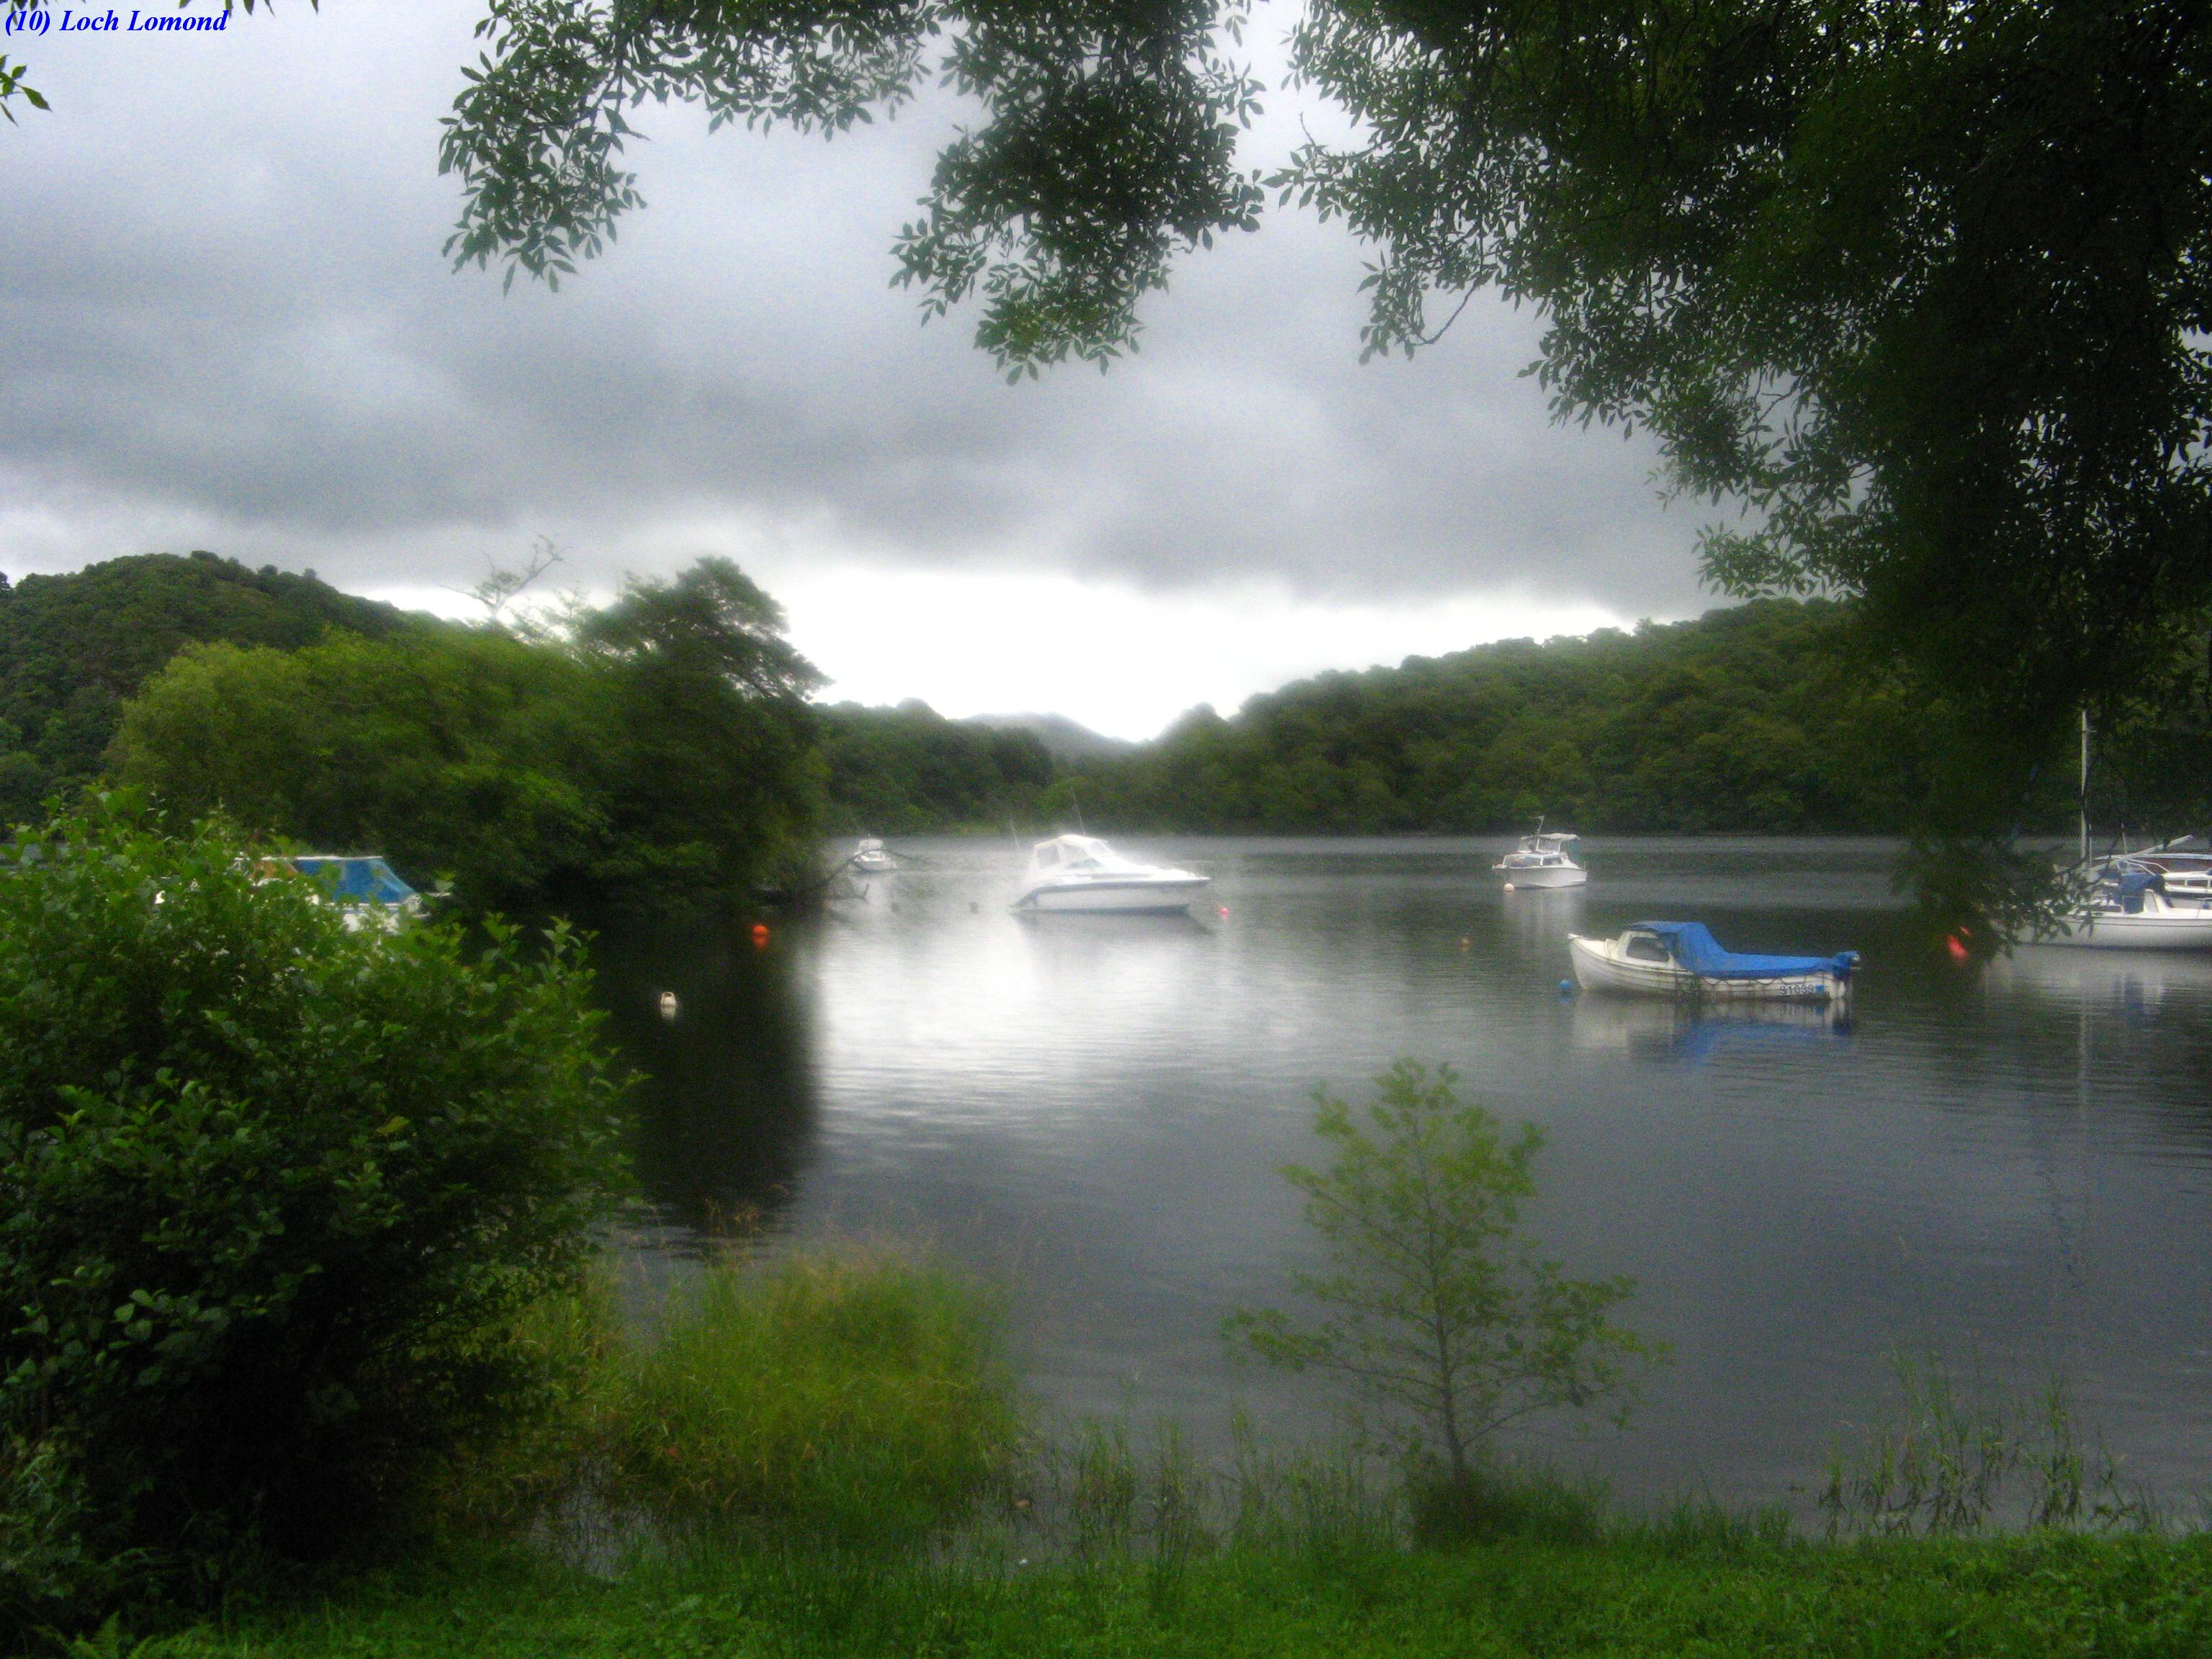 (10) Loch Lomond